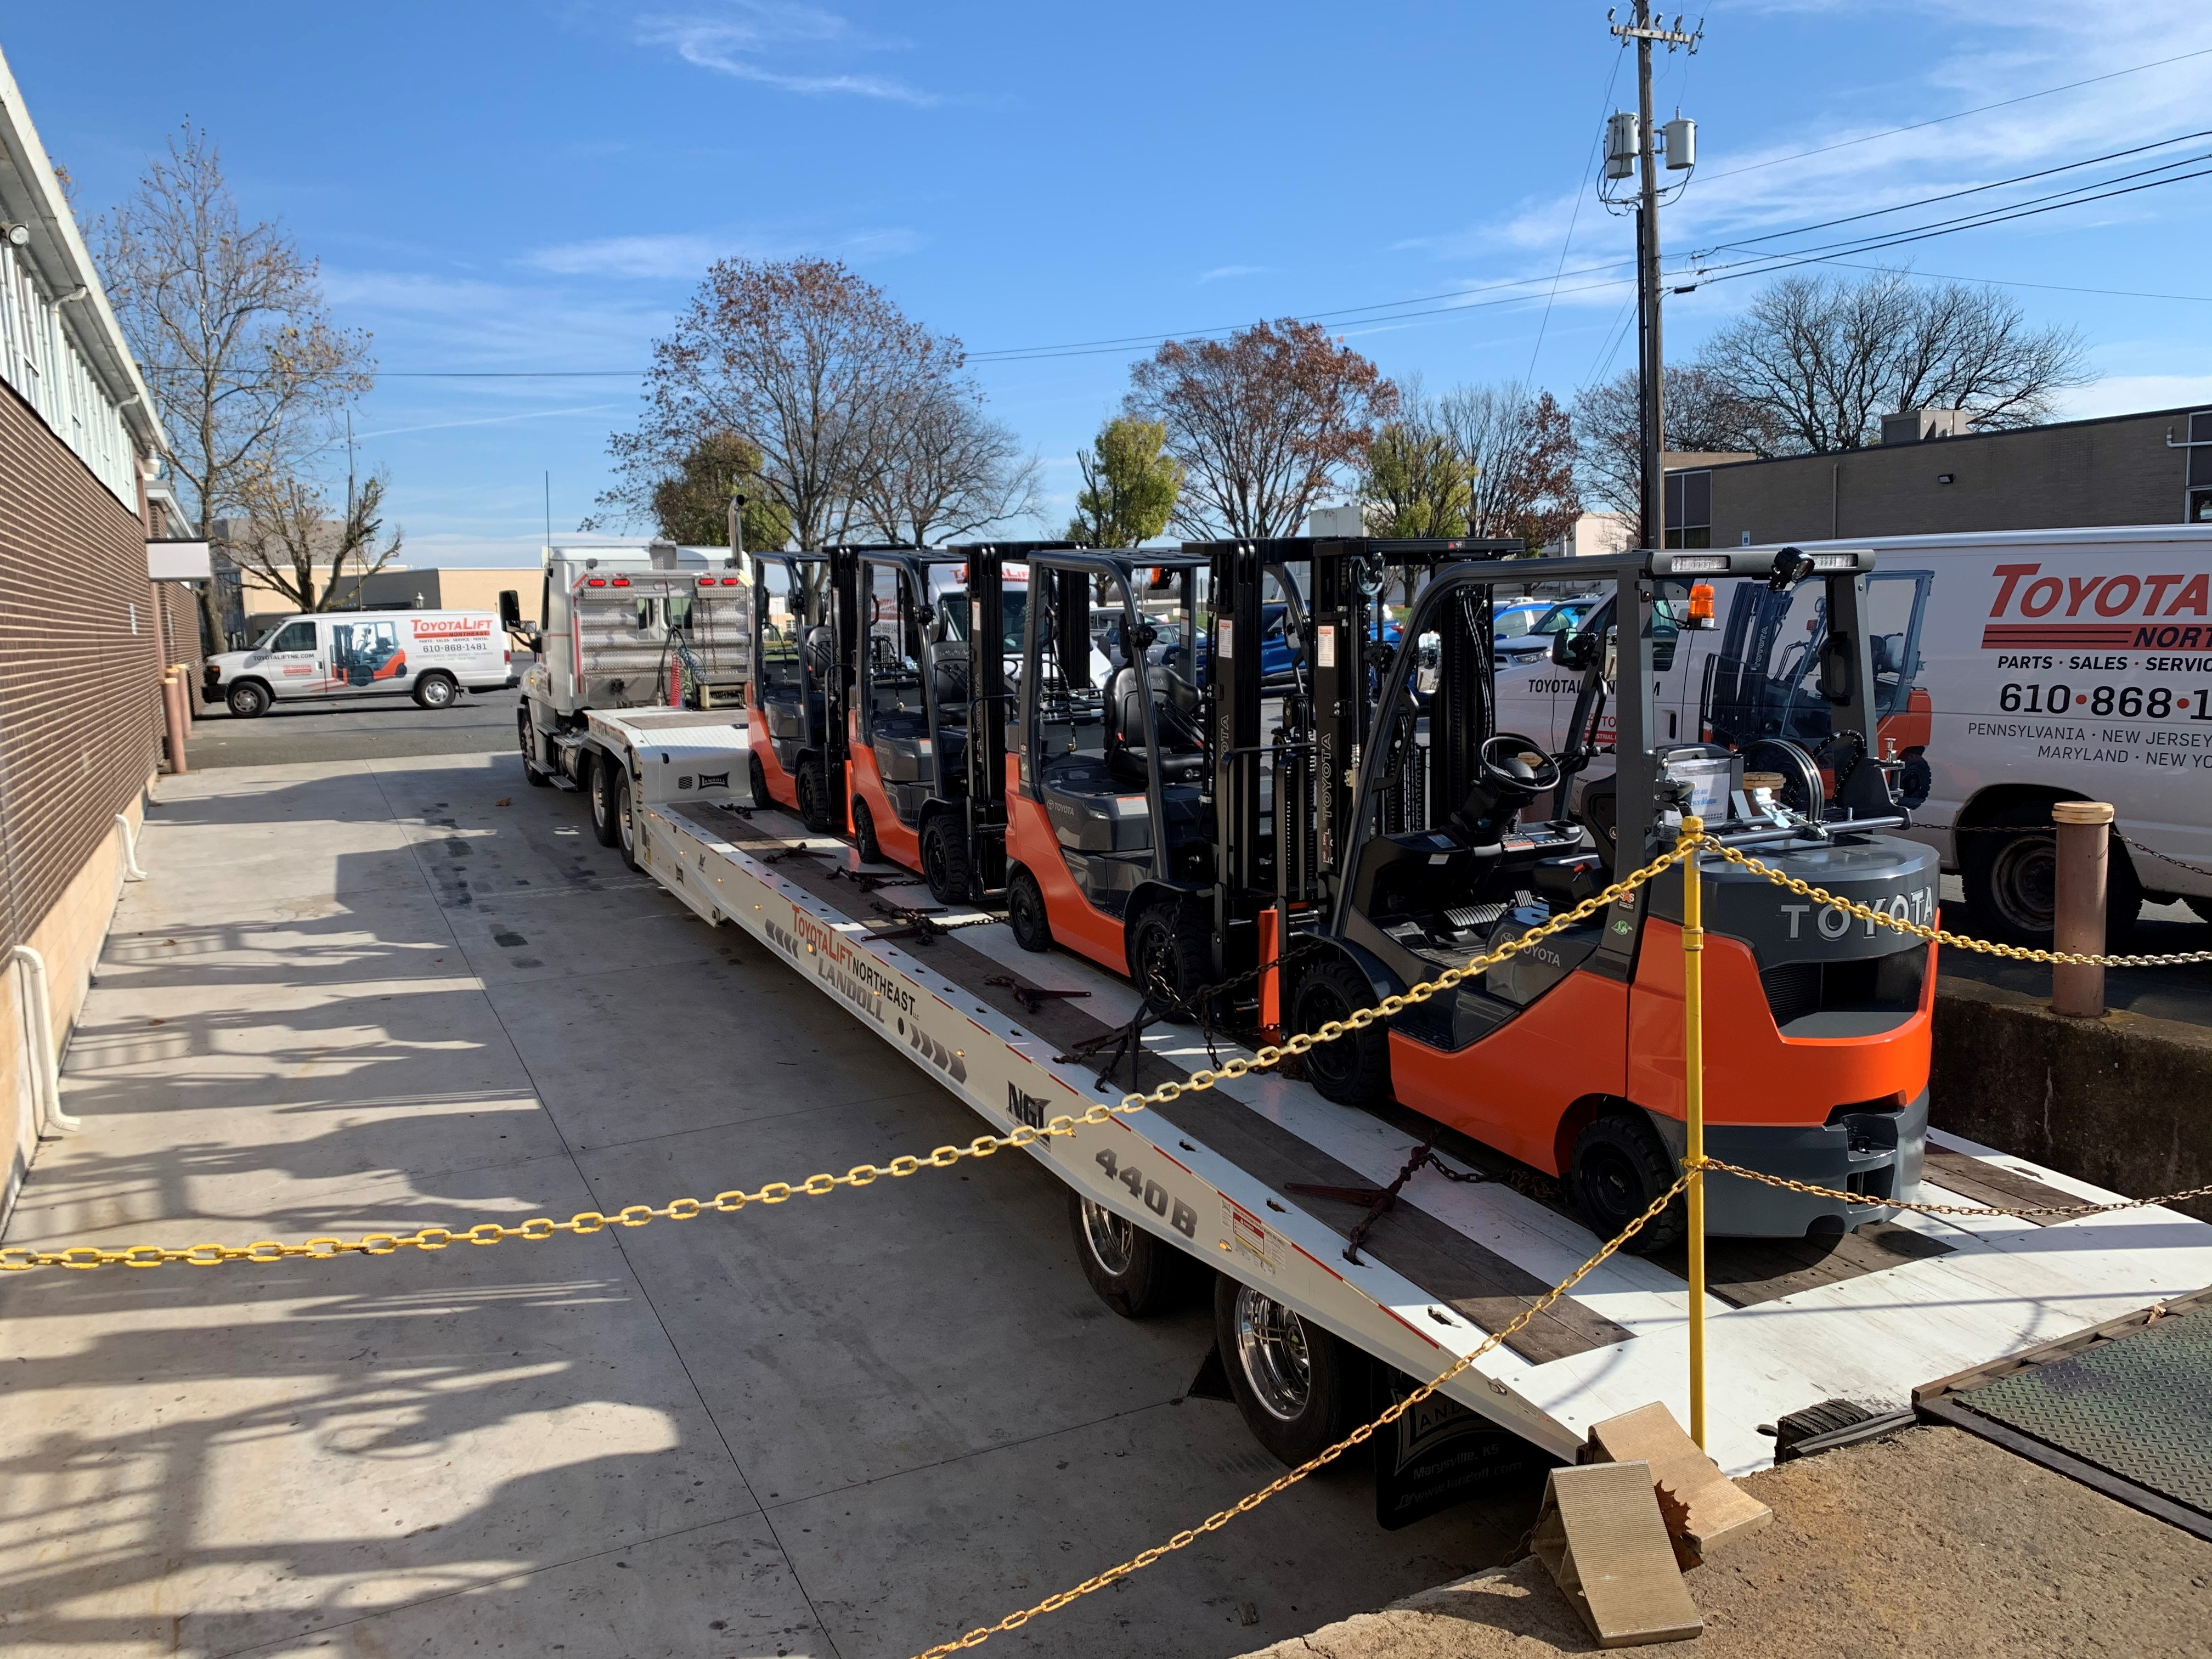 Forklift Rental Shipment